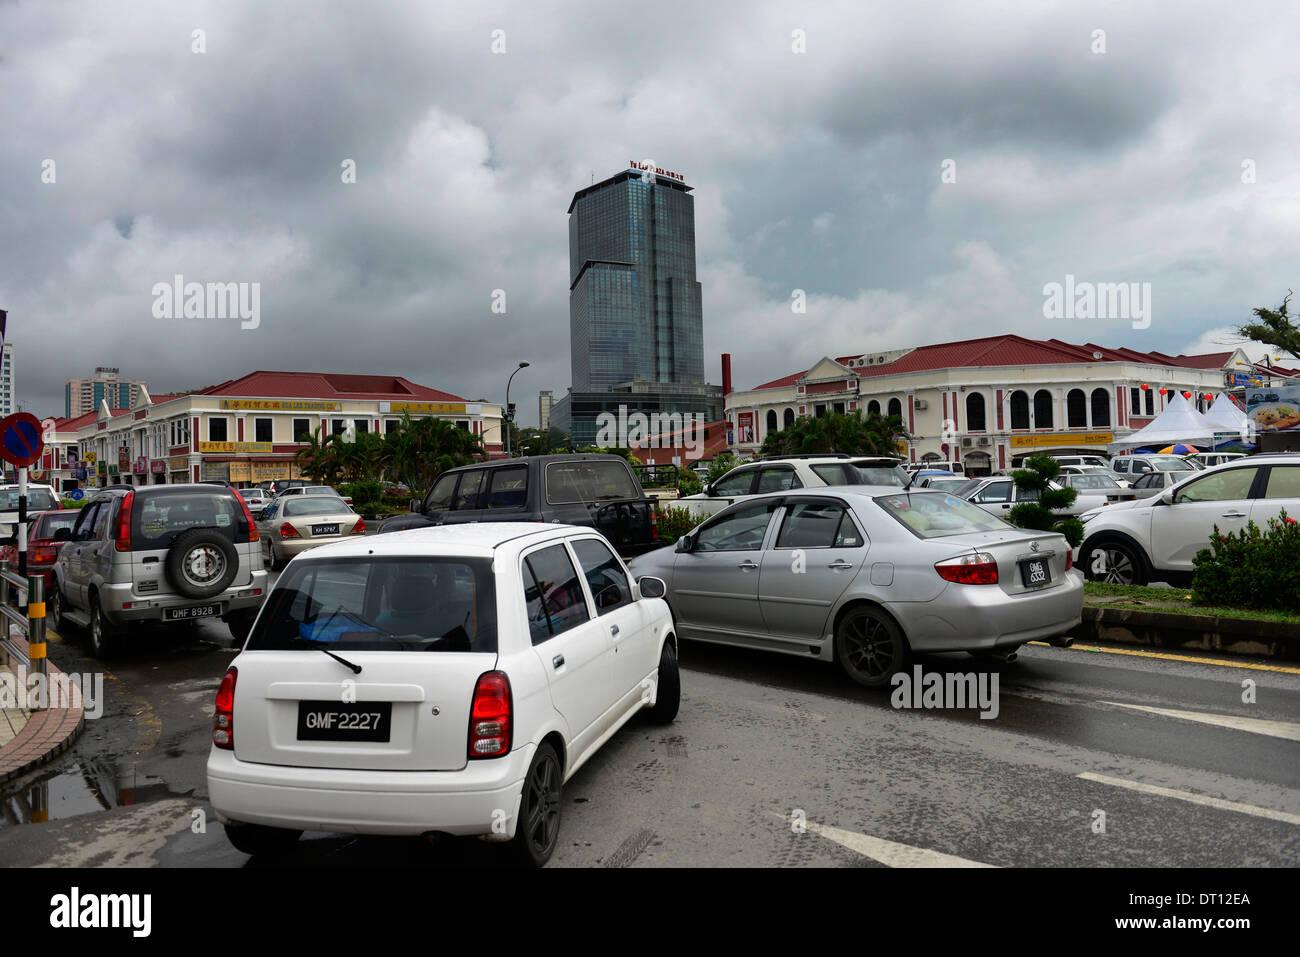 The old city center of Miri, Sarawak. - Stock Image